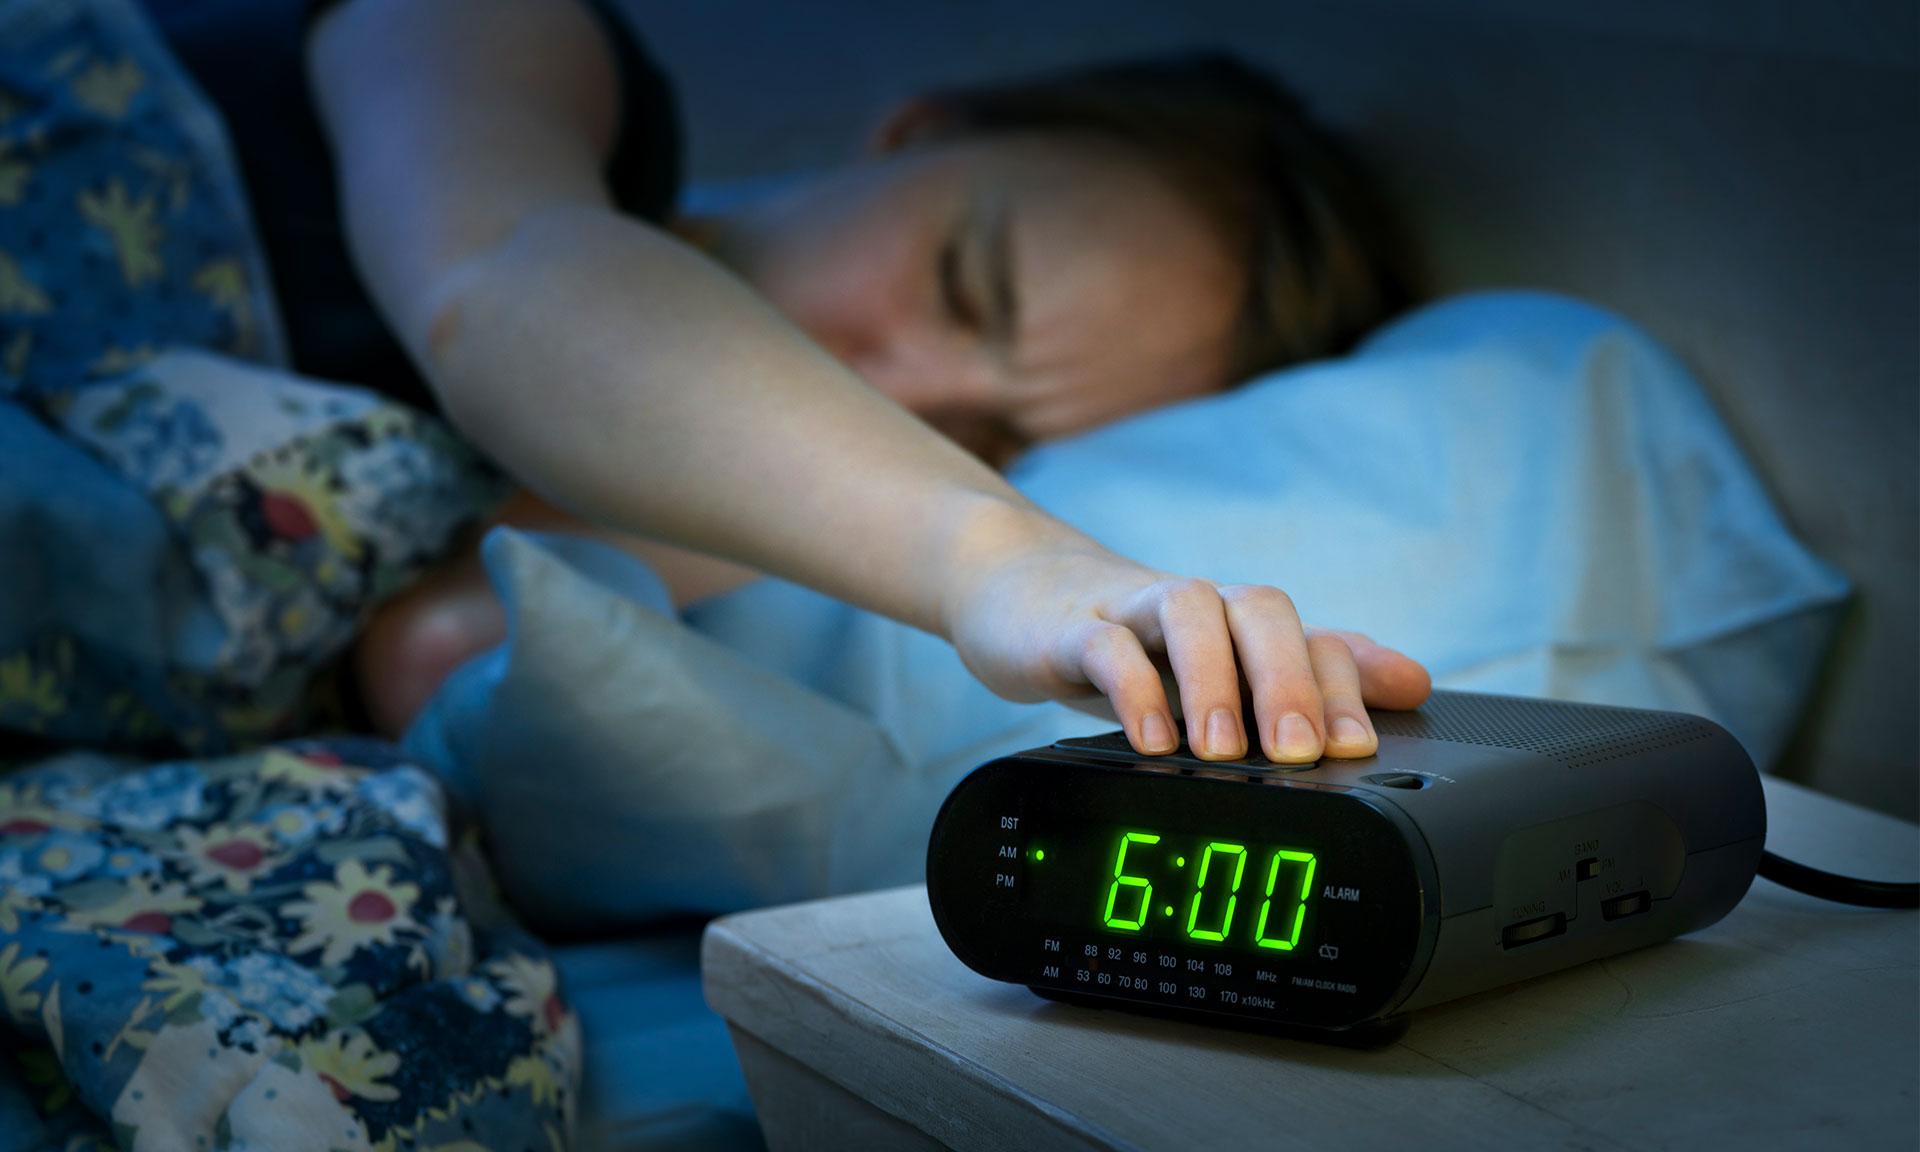 bedr Pro alarm clock radio